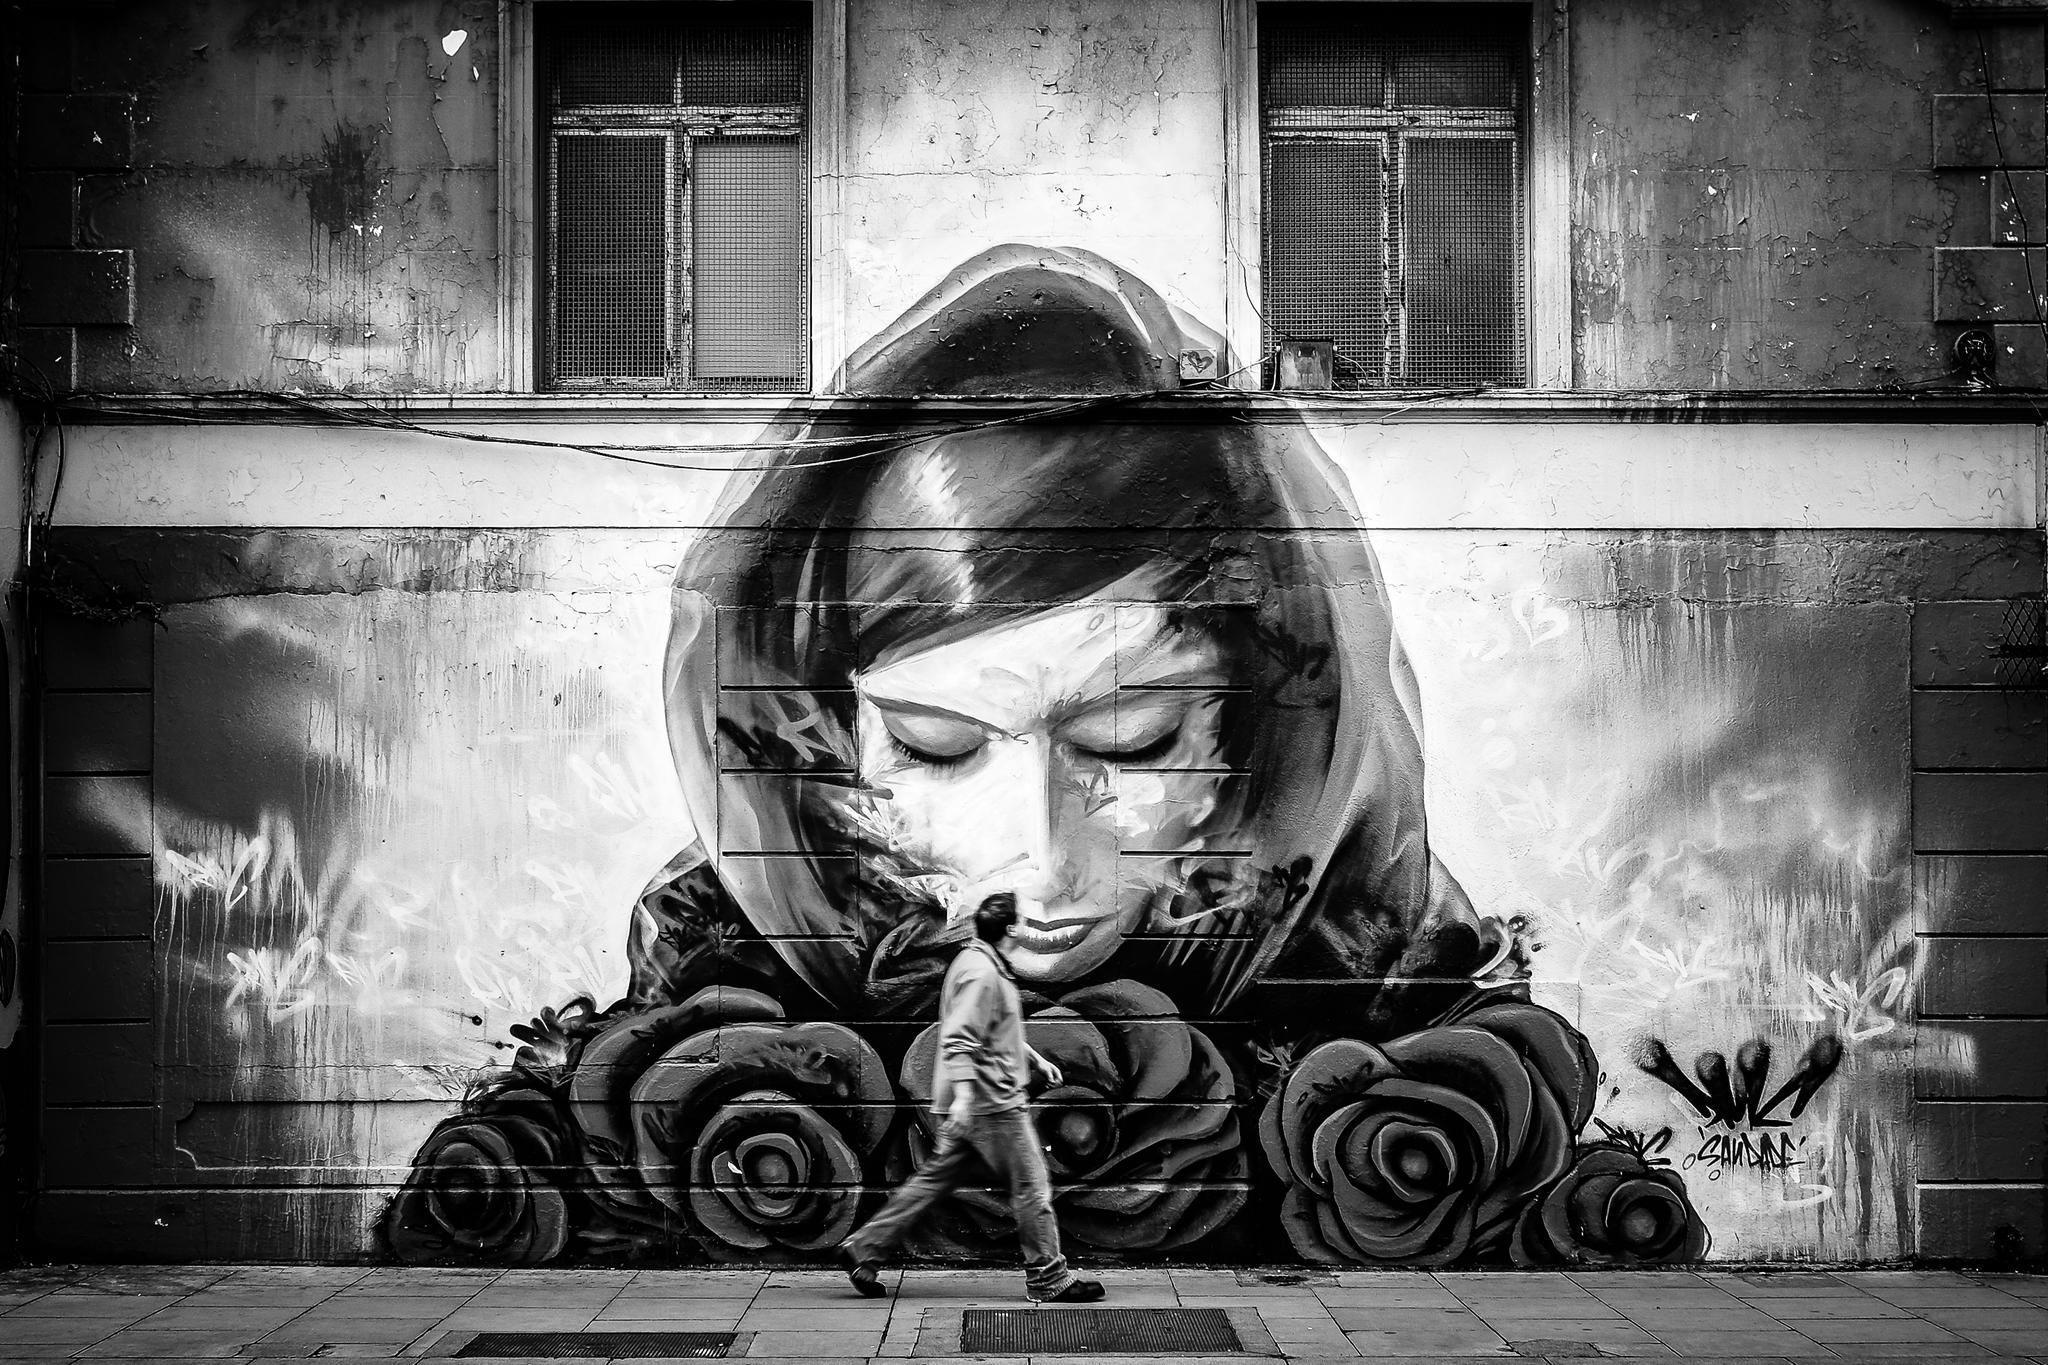 Woman on the wall by gabor nagy on px street art pinterest